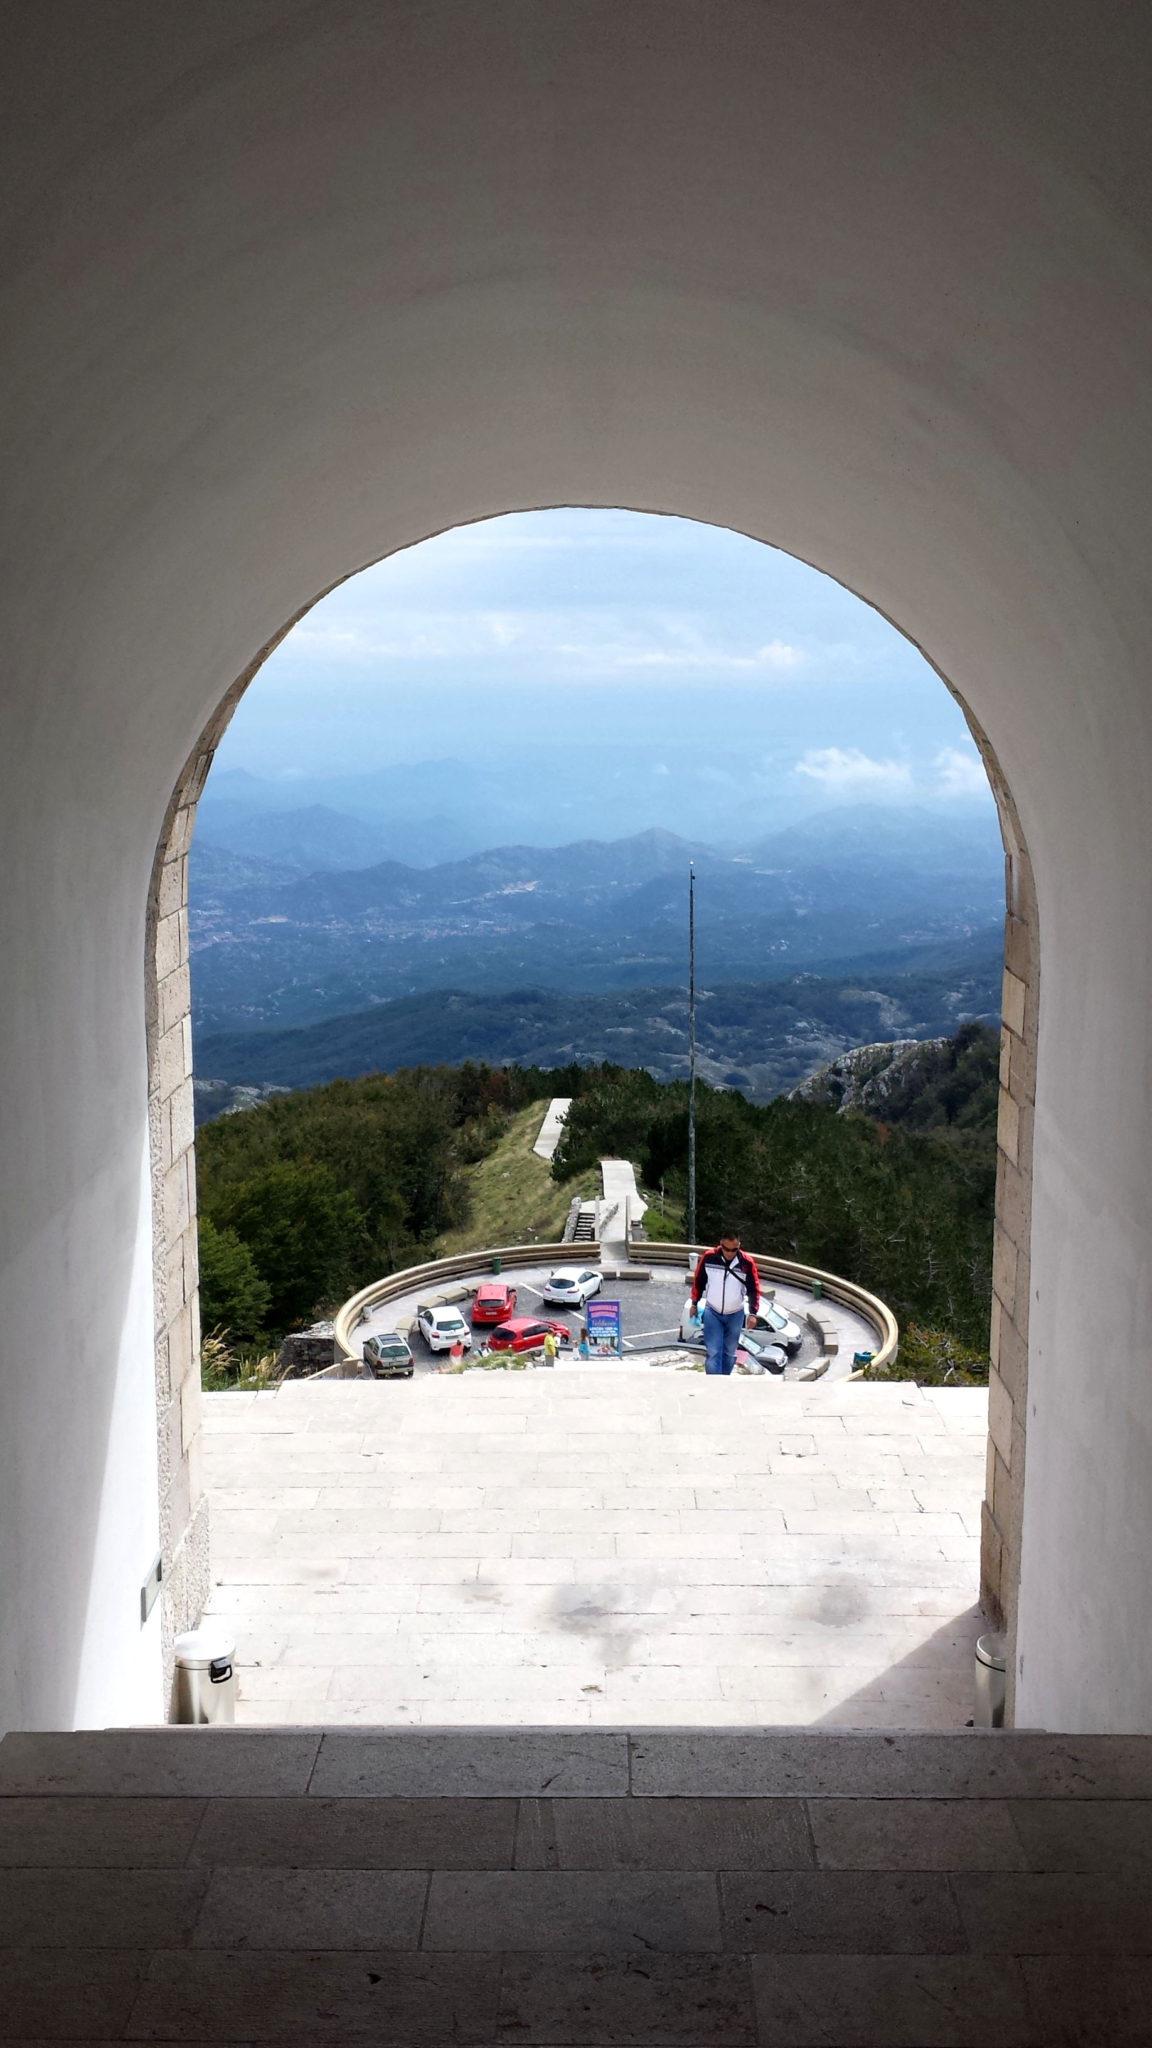 Hema_Le_parc_Lovcen_blog_voyage_travel_mausolee_nejegos17